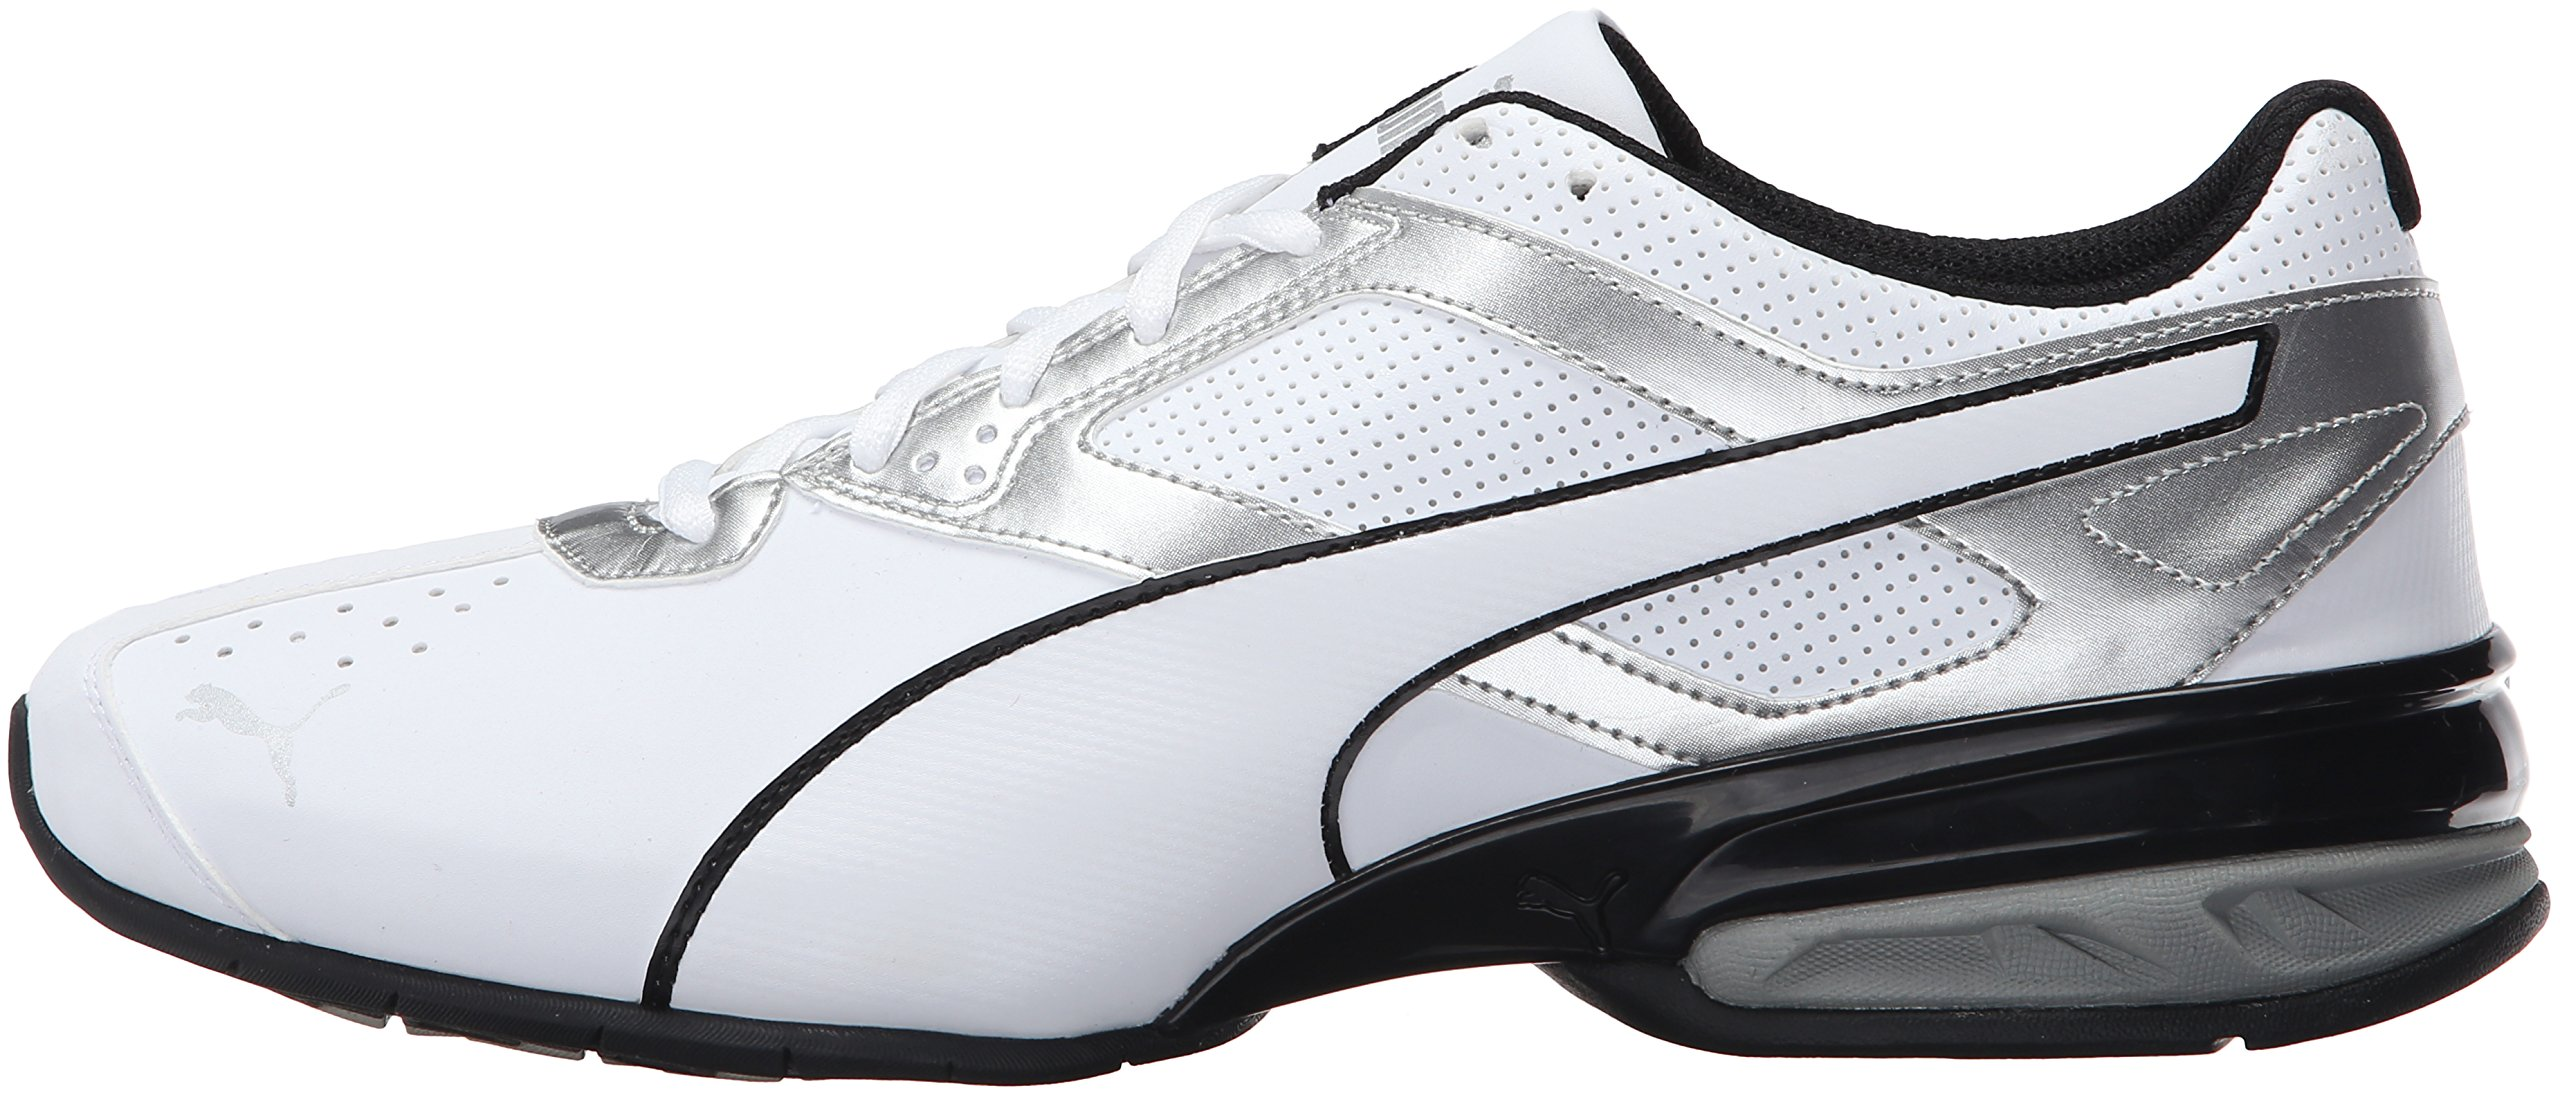 PUMA Men's Tazon 6 FM Puma White/ Puma Silver Running Shoe - 7.5 D(M) US by PUMA (Image #5)